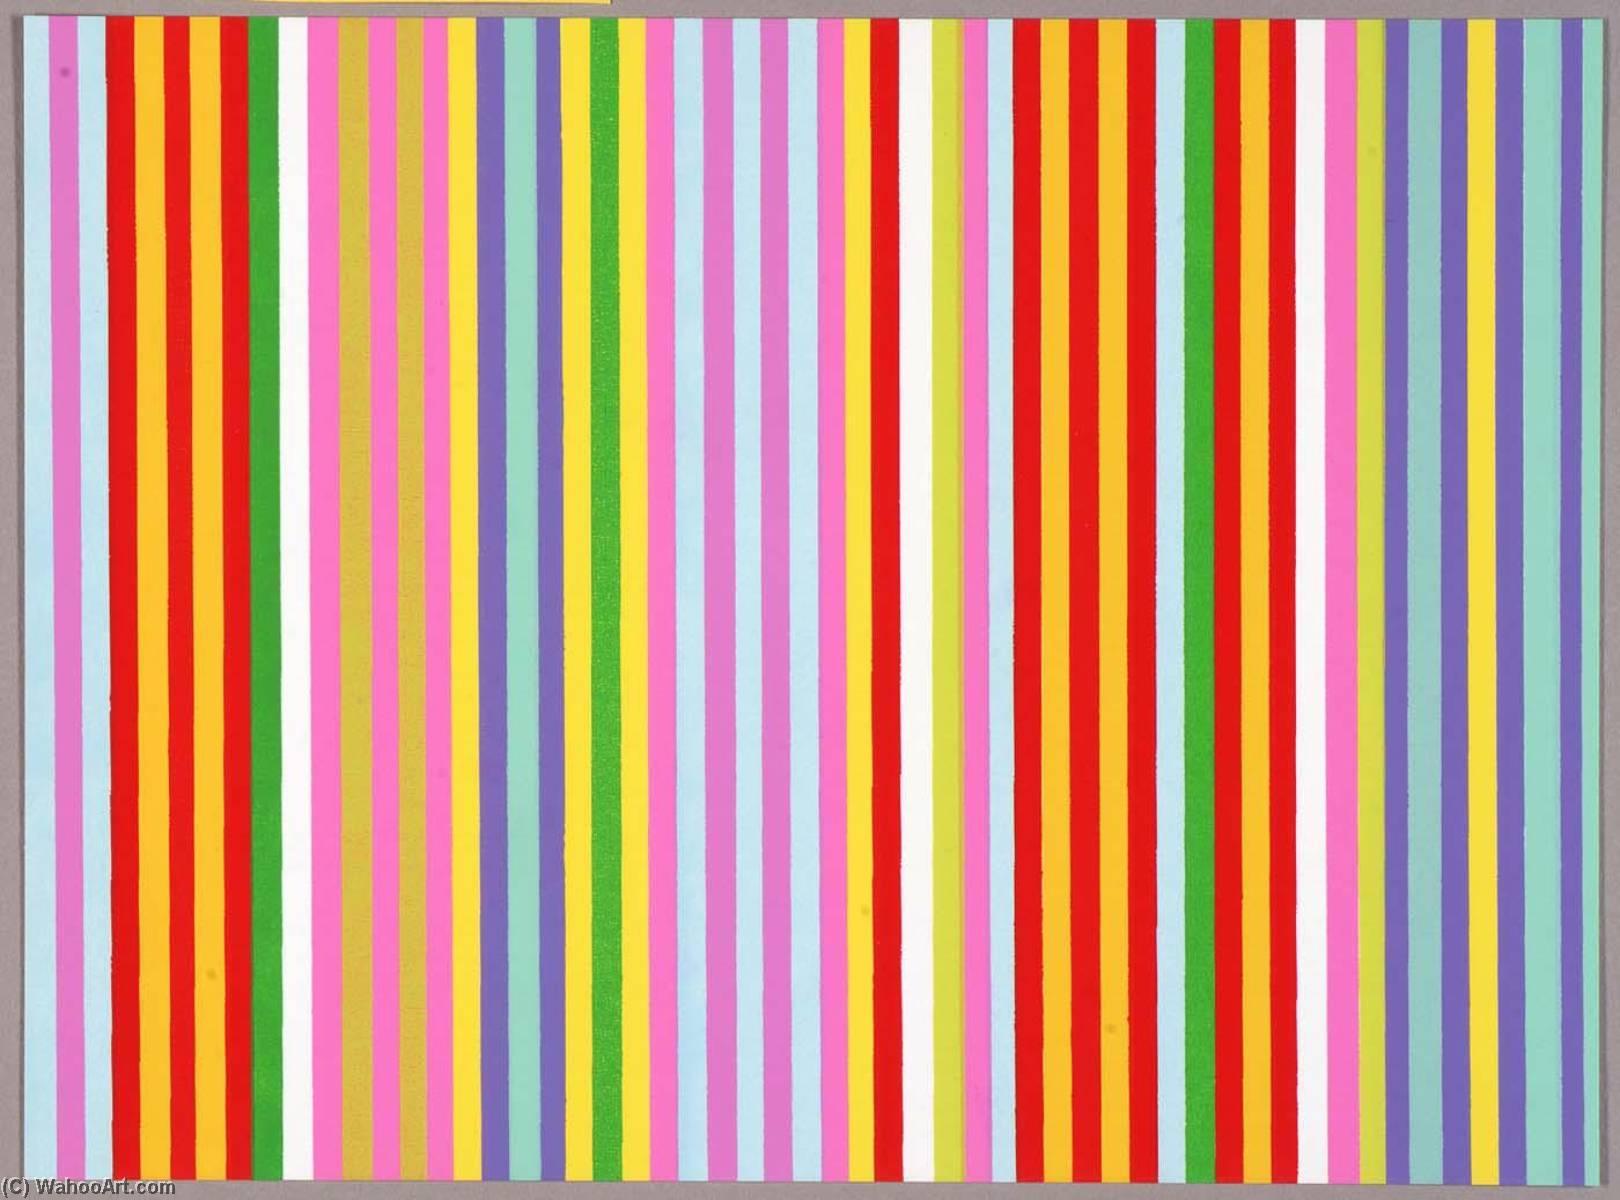 WikiOO.org - Енциклопедія образотворчого мистецтва - Живопис, Картини  Gene Davis - Powwow